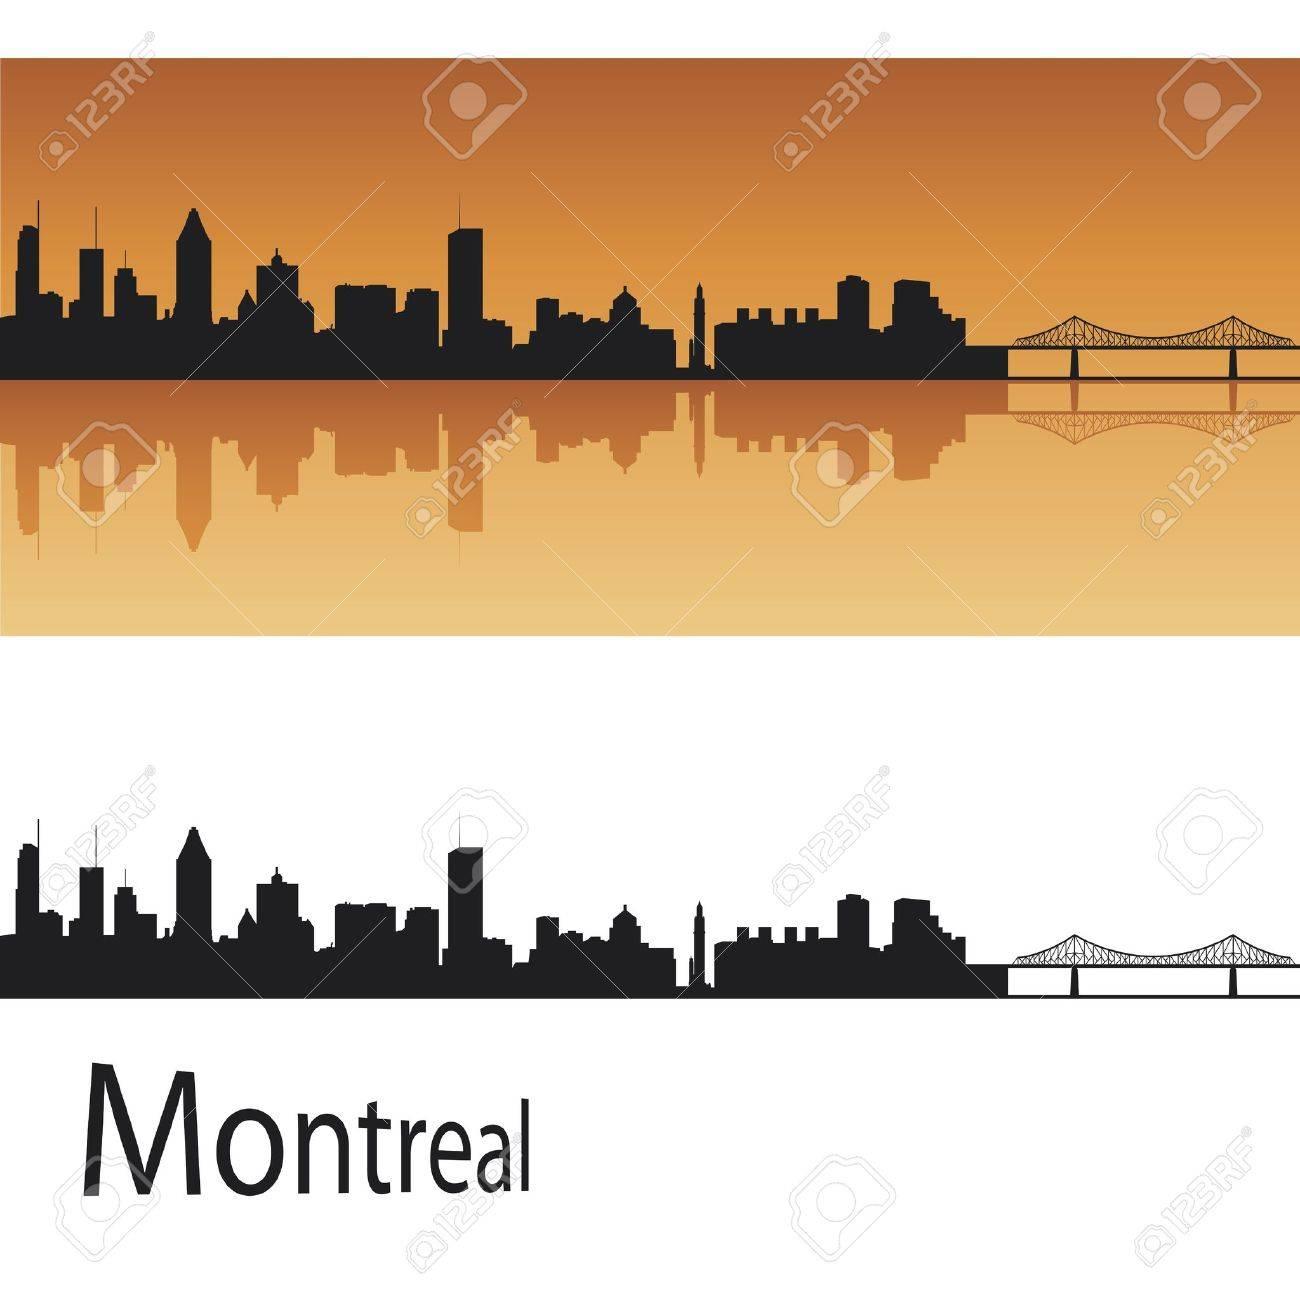 Montreal skyline in orange background in editable vector file Stock Vector - 12902437